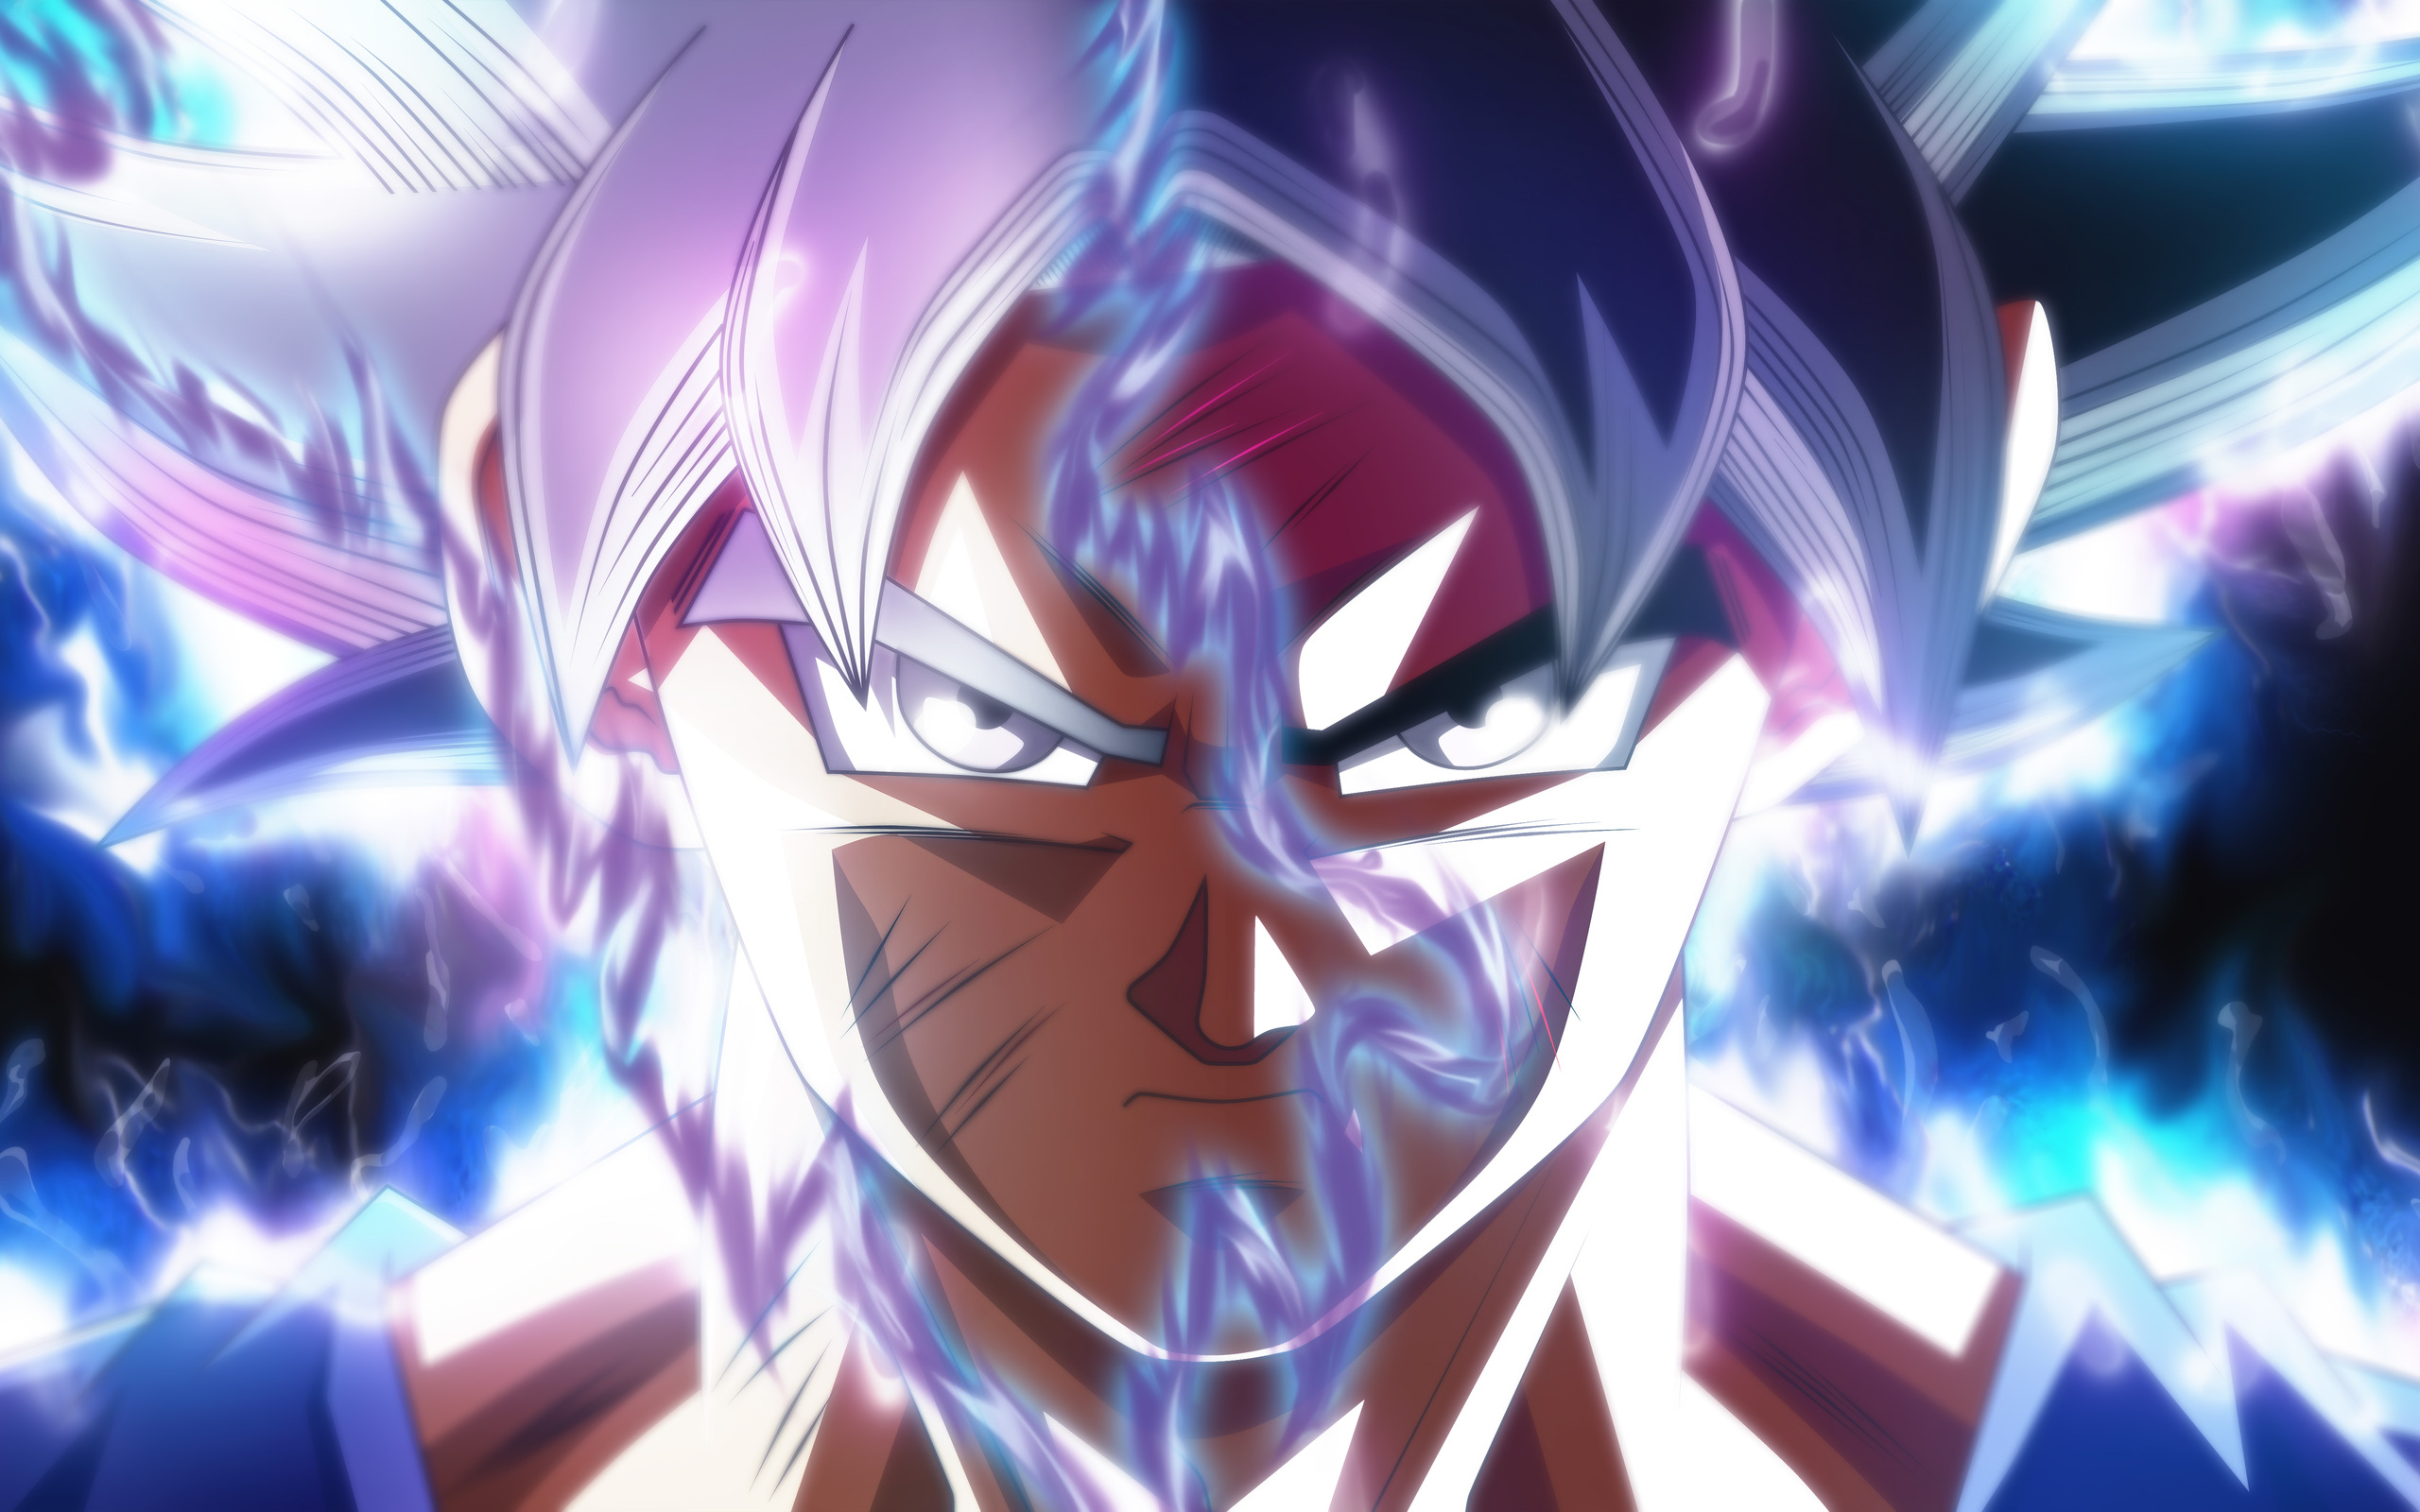 goku-ultra-instinct-transformation-0p.jpg